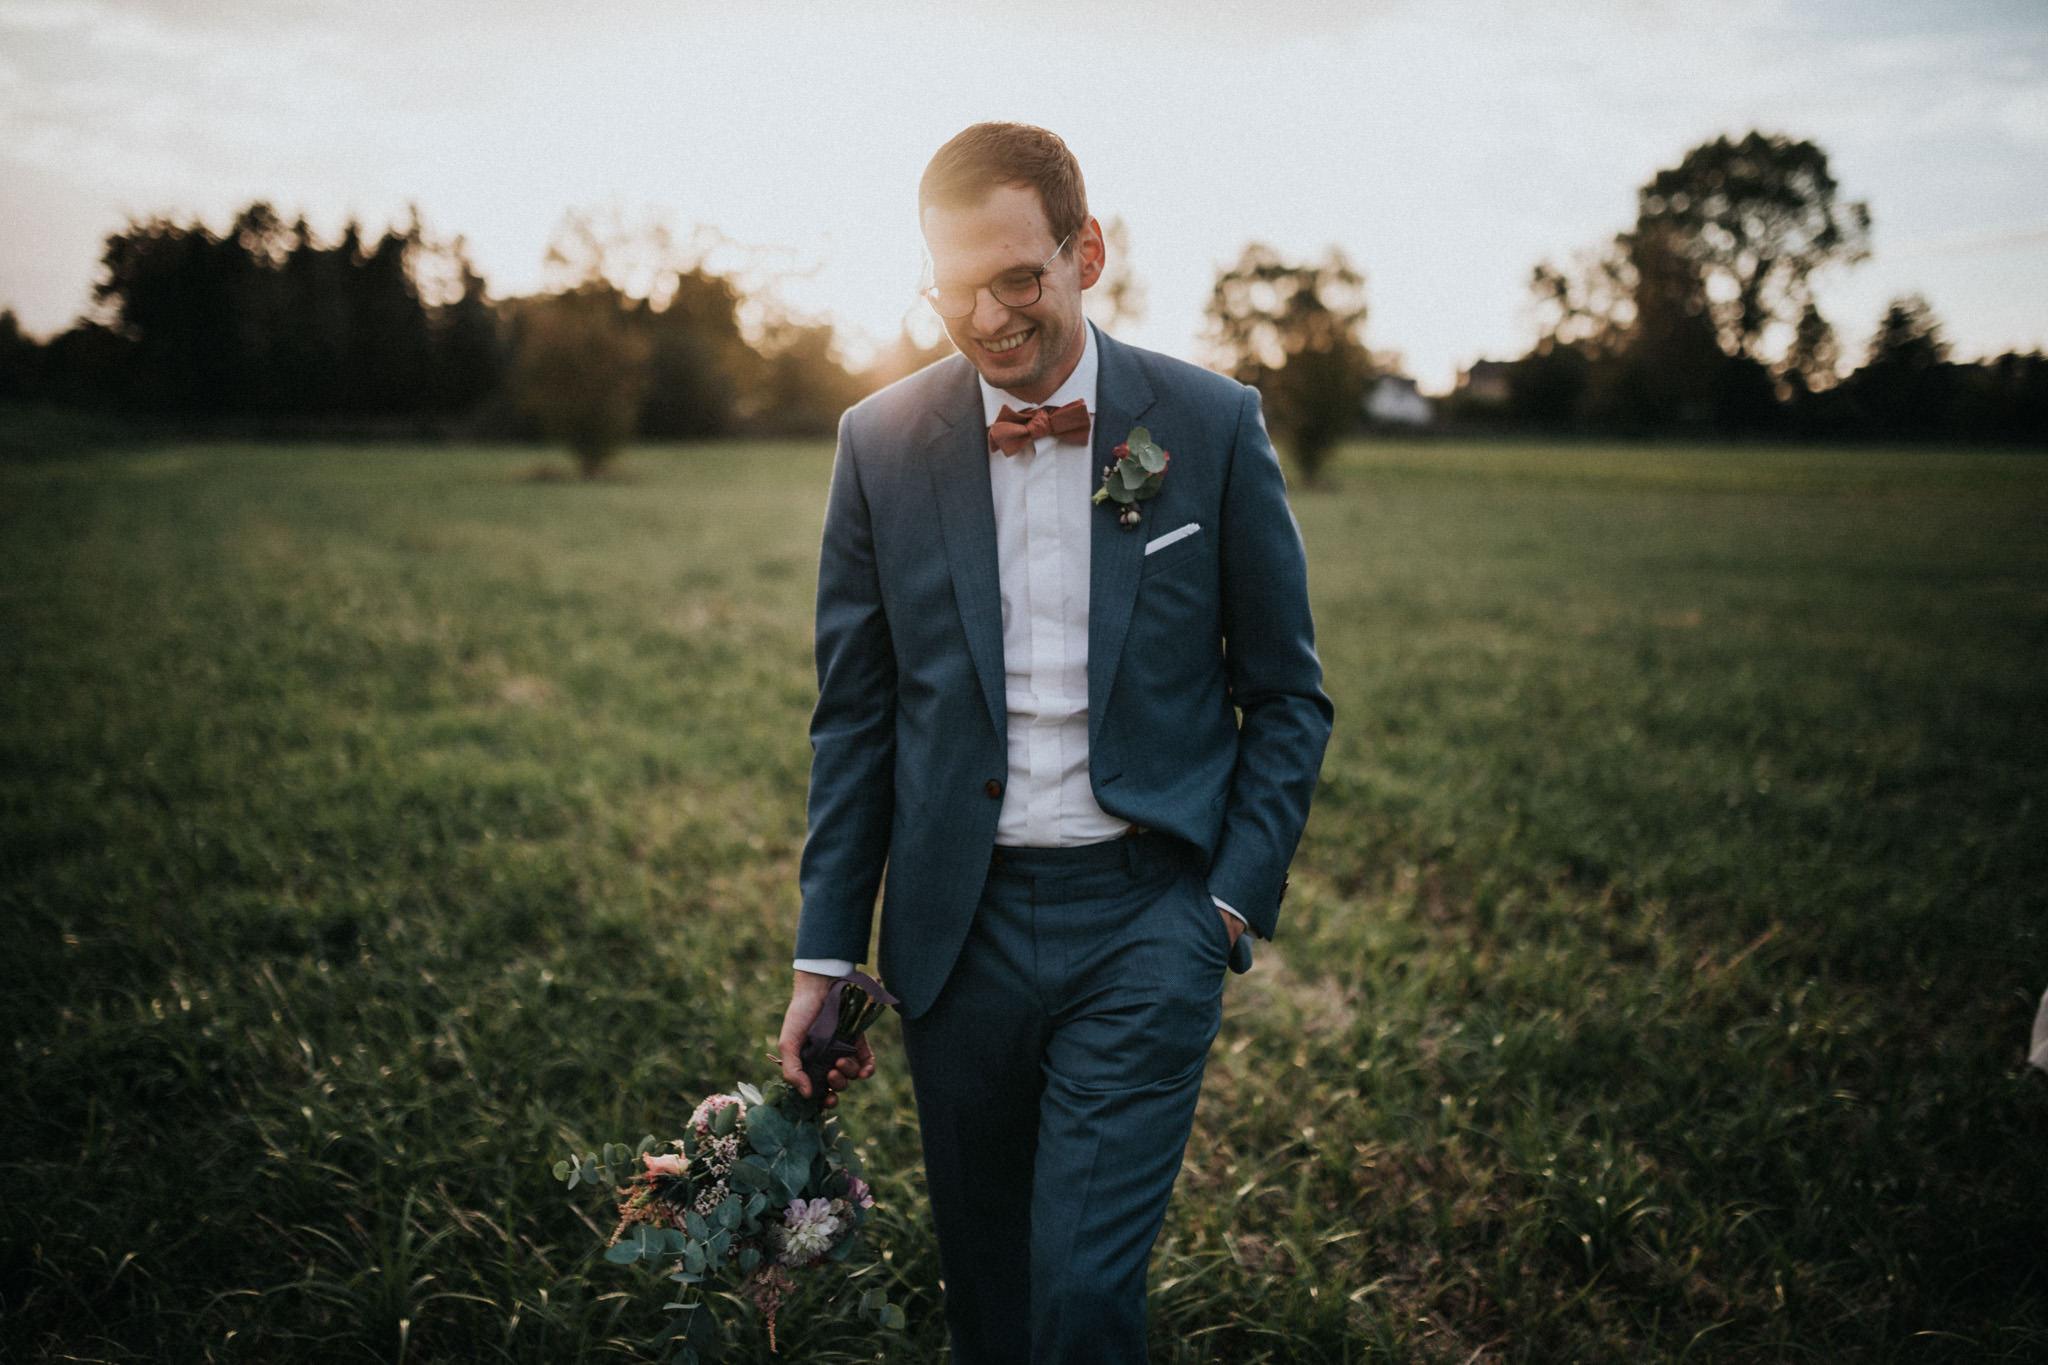 Hochzeitsfotograf-Homberg-56.jpg